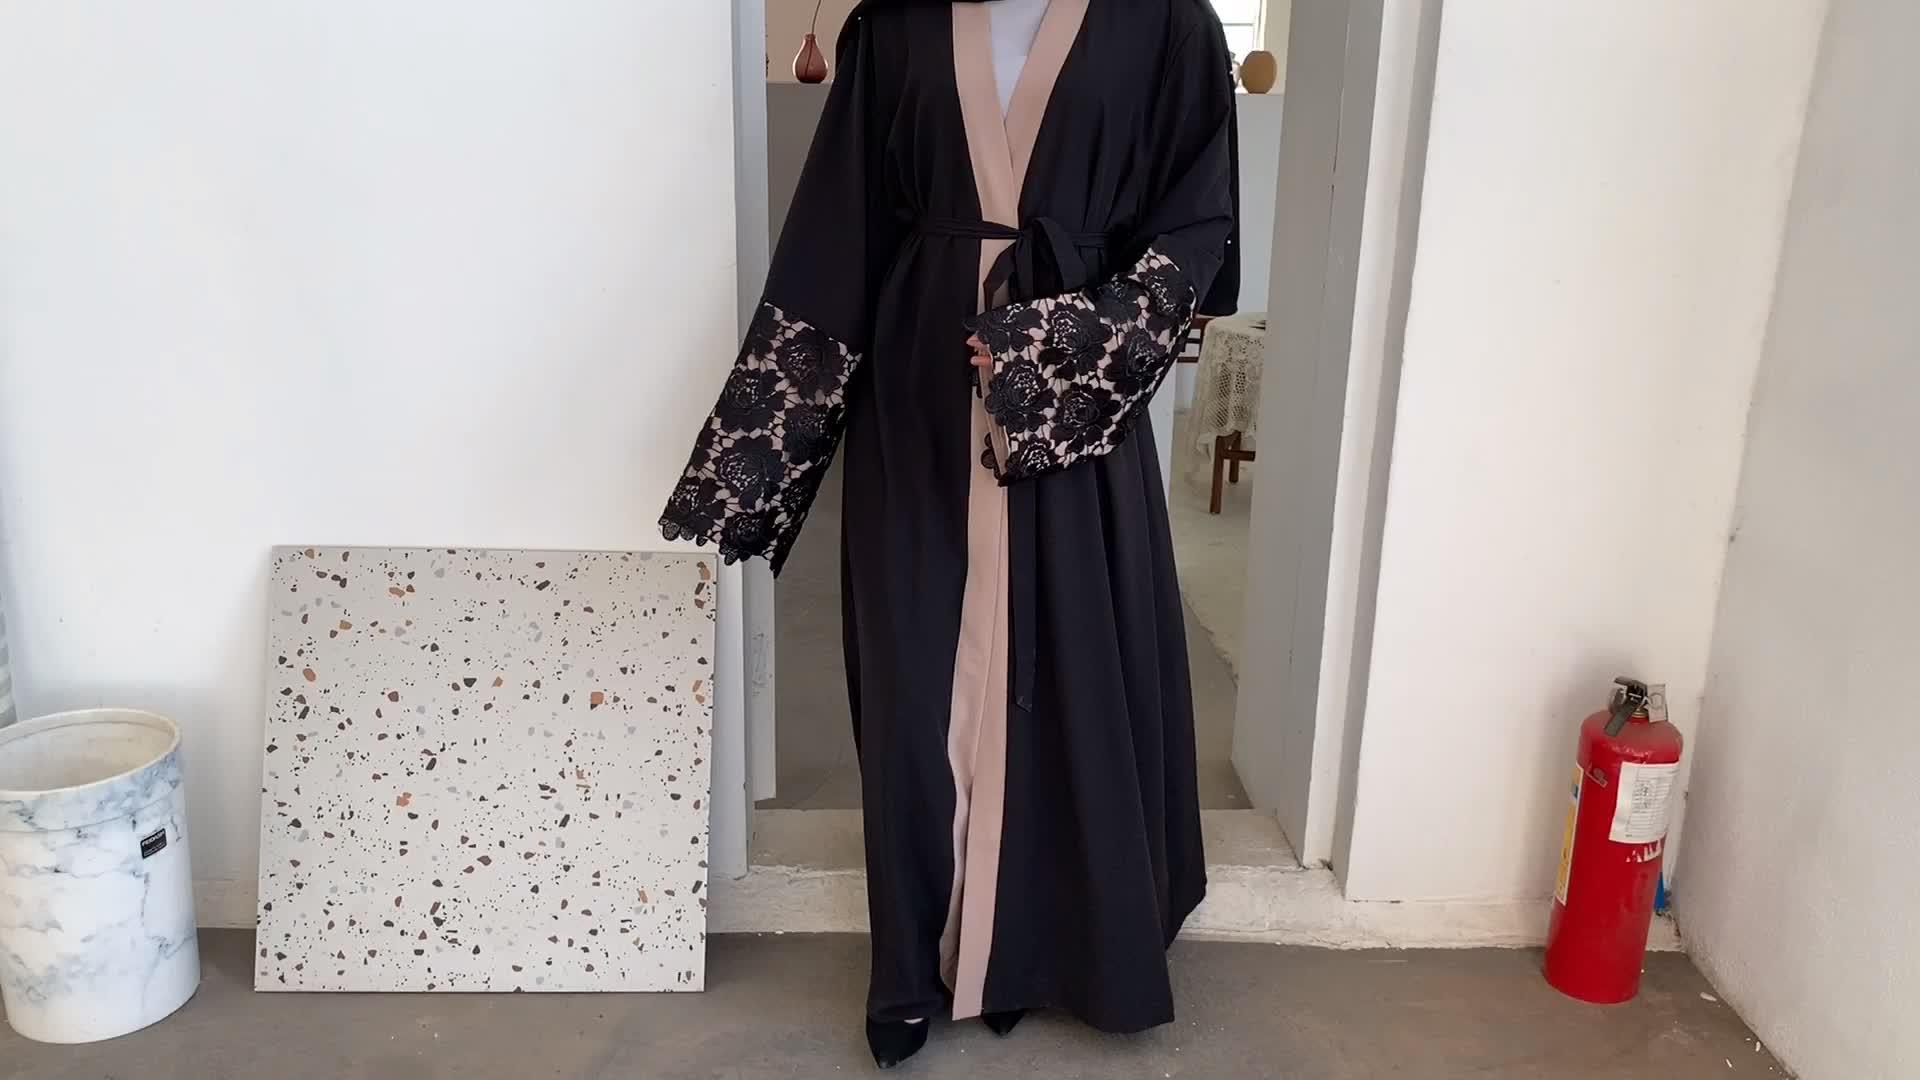 1502 #2020 Desain Baru Terbaru Kardigan Bordir Pakaian Islami Mode Kimono Terbuka Depan Gaya Arab Dubai Muslim Abaya